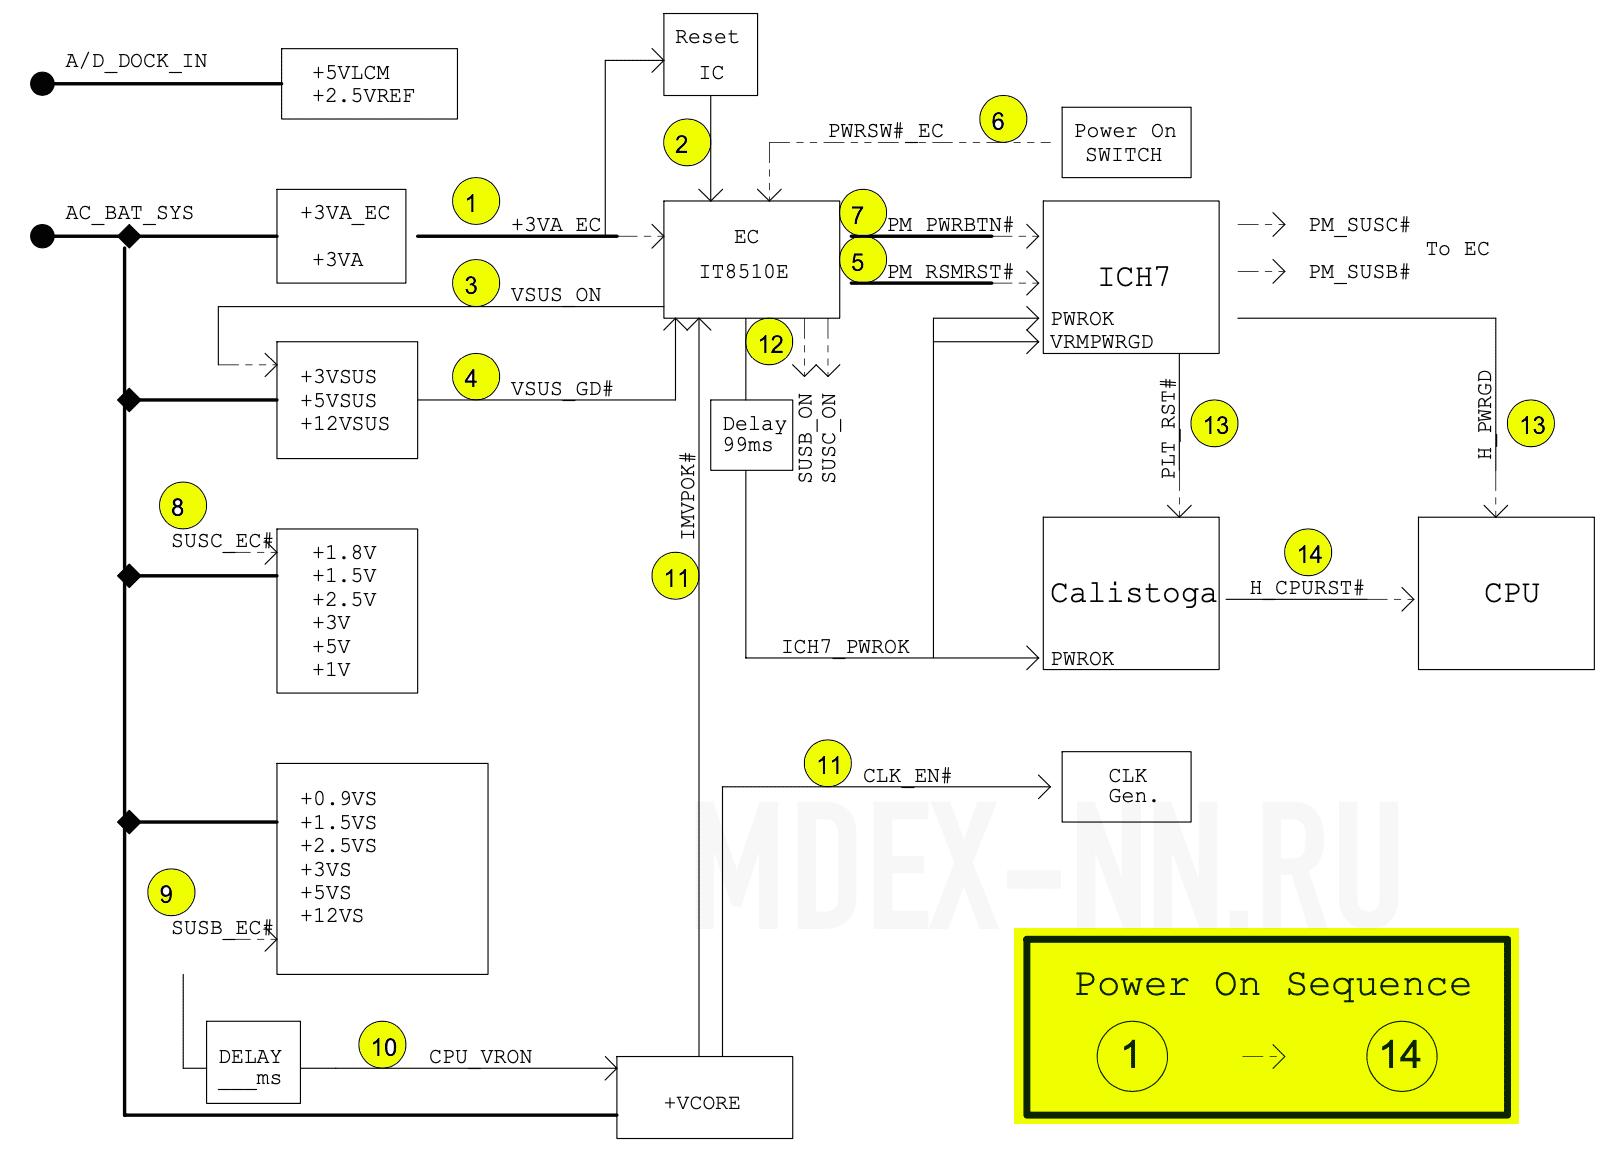 Схема POWER On Sequence ноутбука ASUS A6F